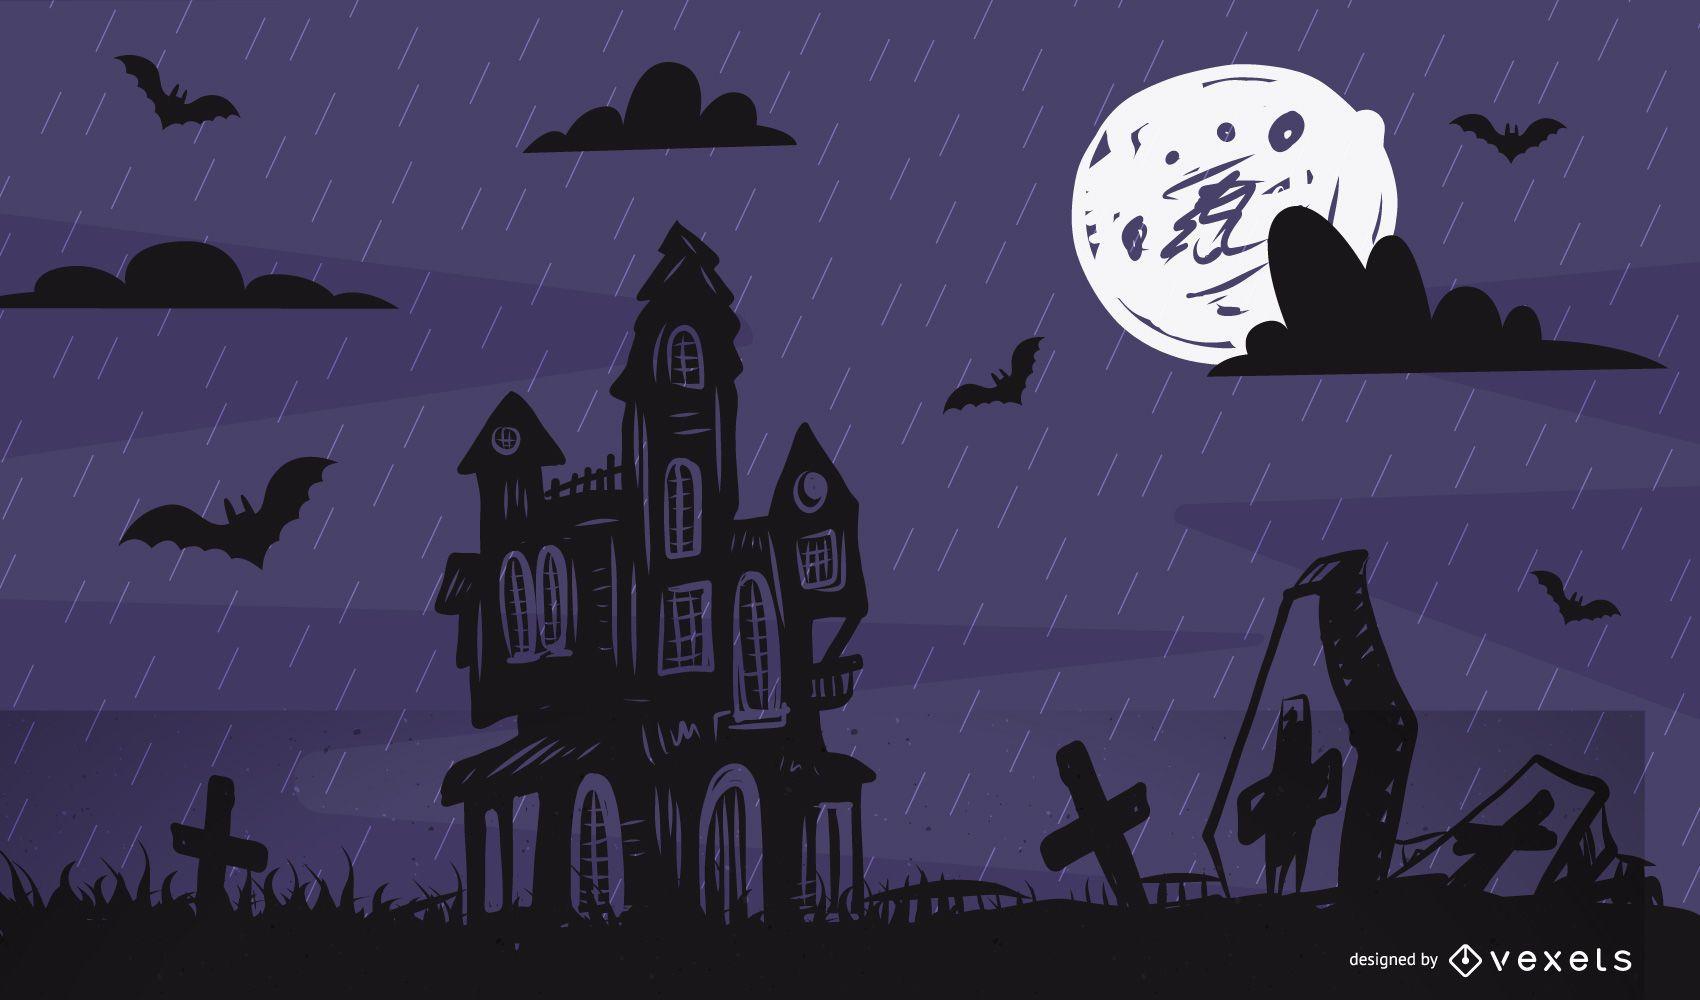 Plantilla de póster de Halloween de caza de luna llena